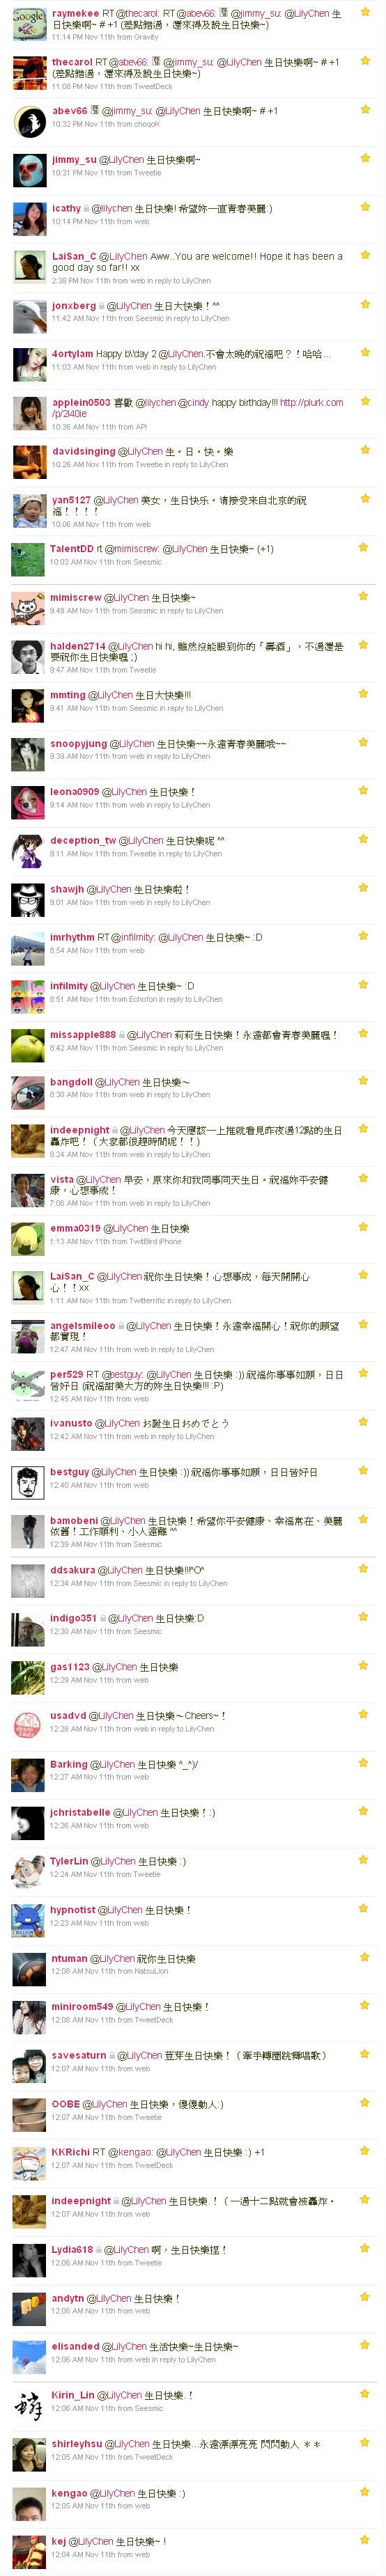 2009MyBirthdayTweets